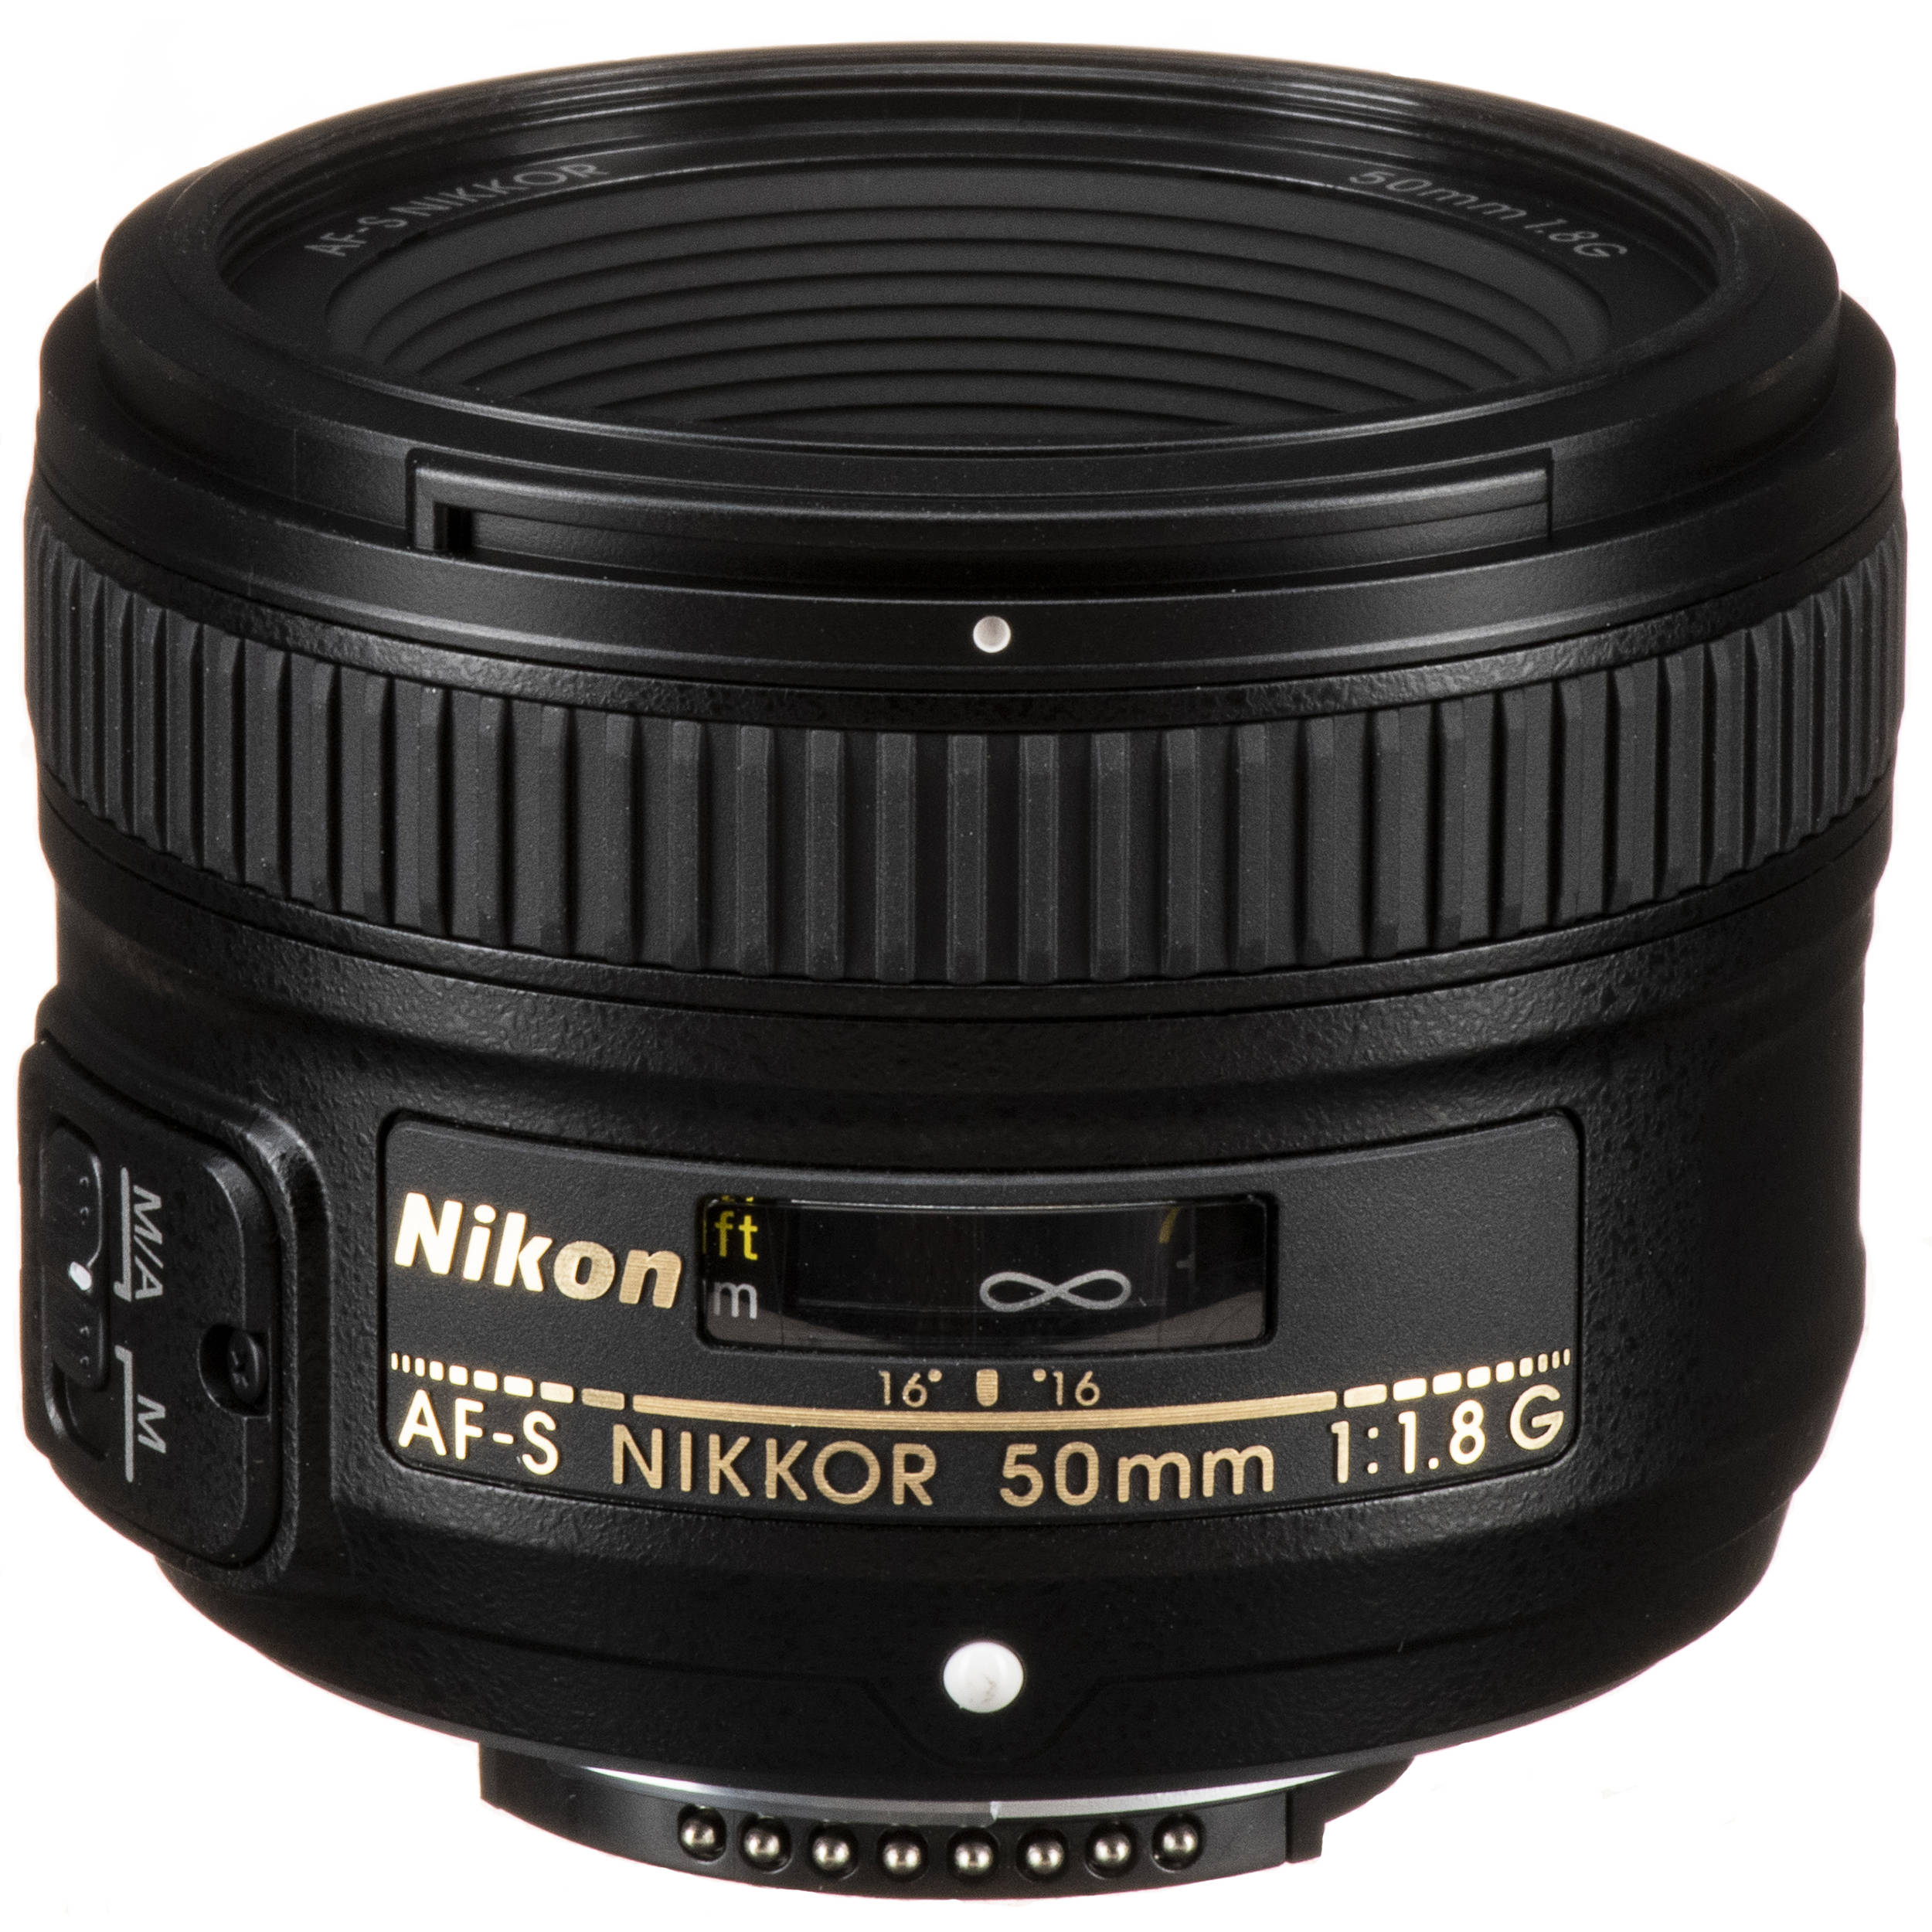 Nikon-50mm-f